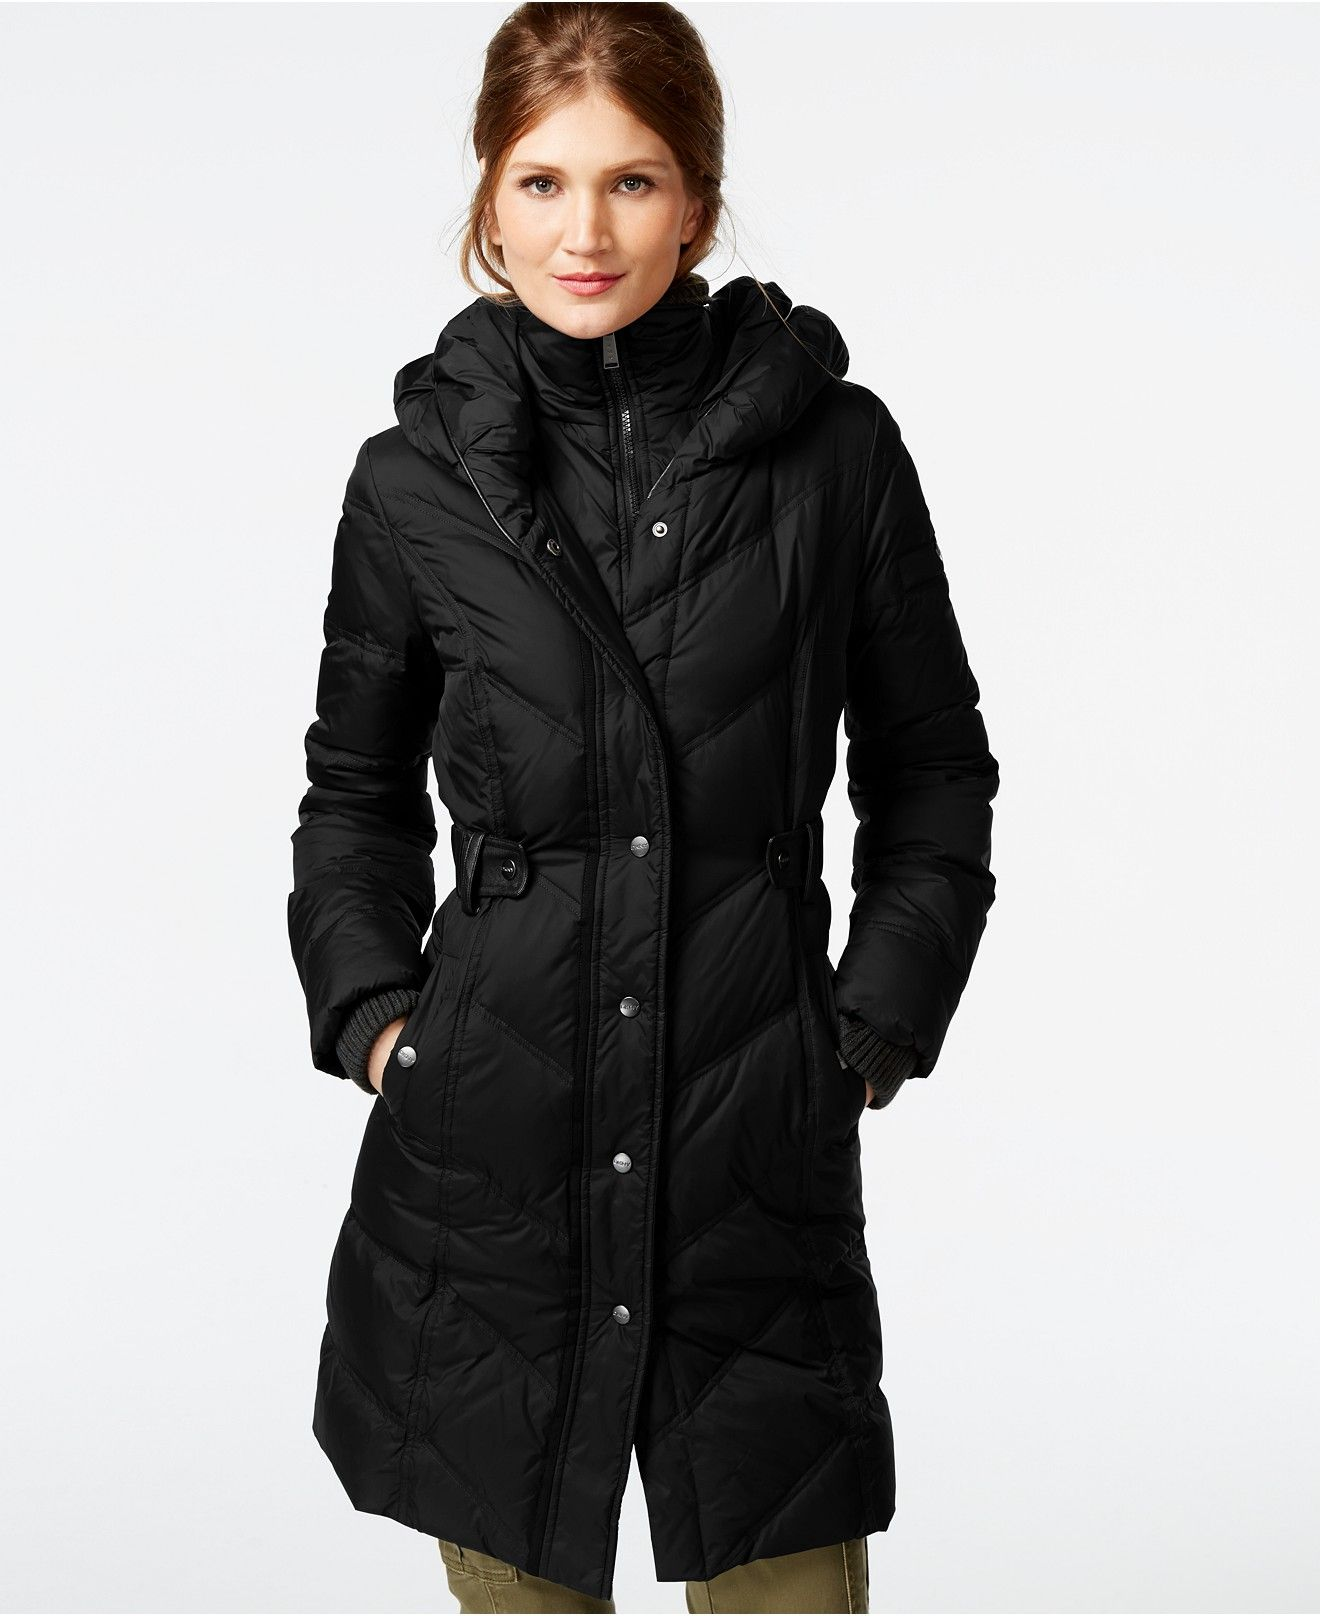 47de1f46b DKNY Faux-Leather-Trim Quilted Down Coat - Coats - Women - Macy's ...